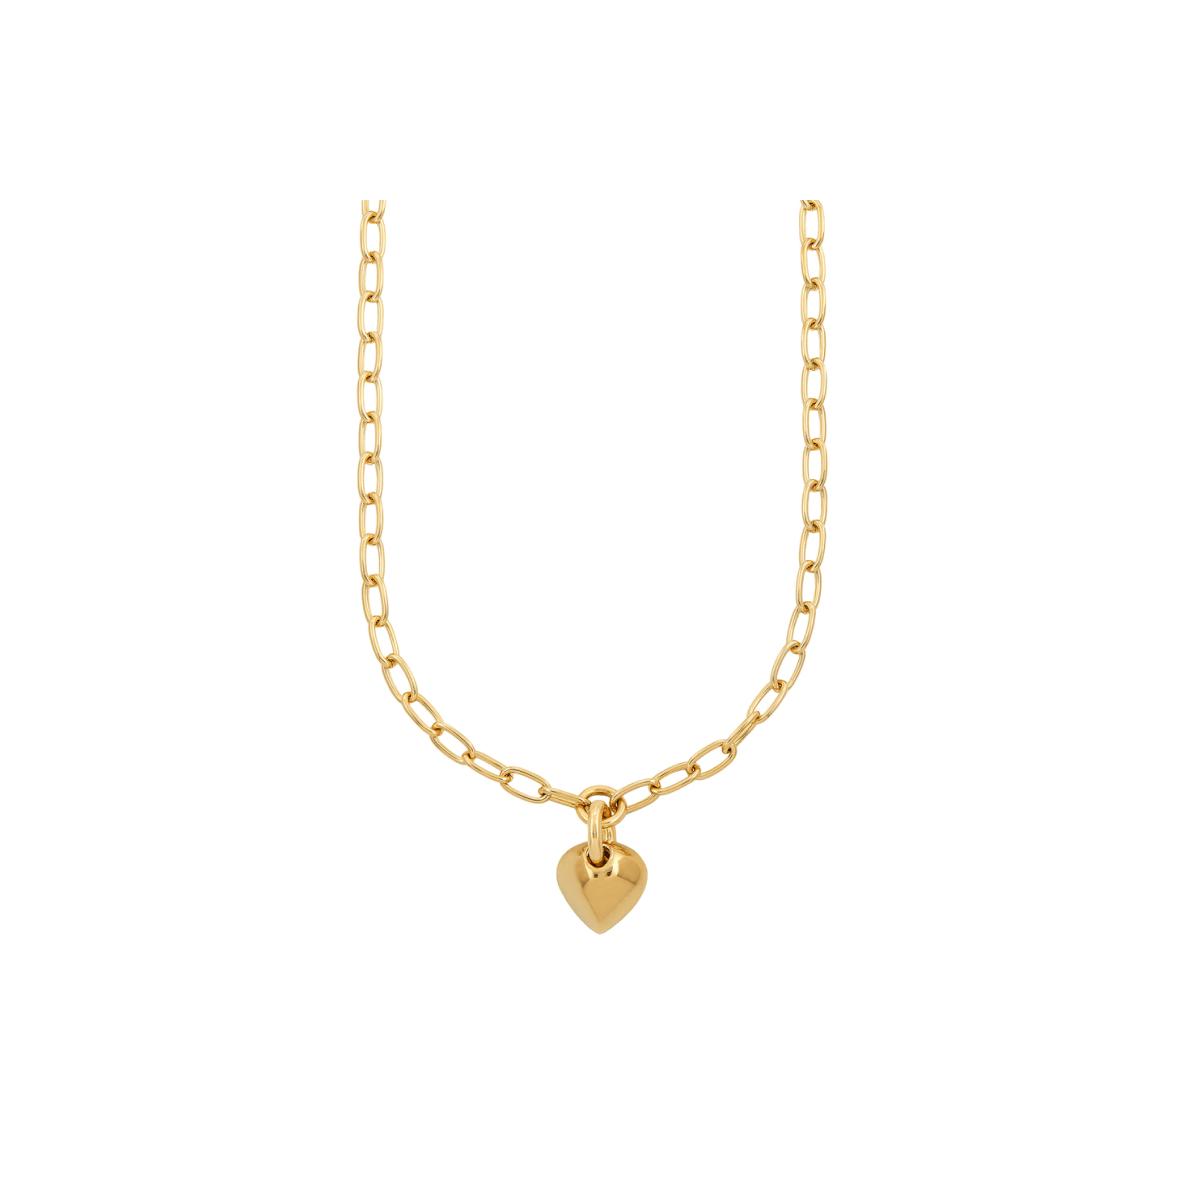 Laura Lombardi necklace